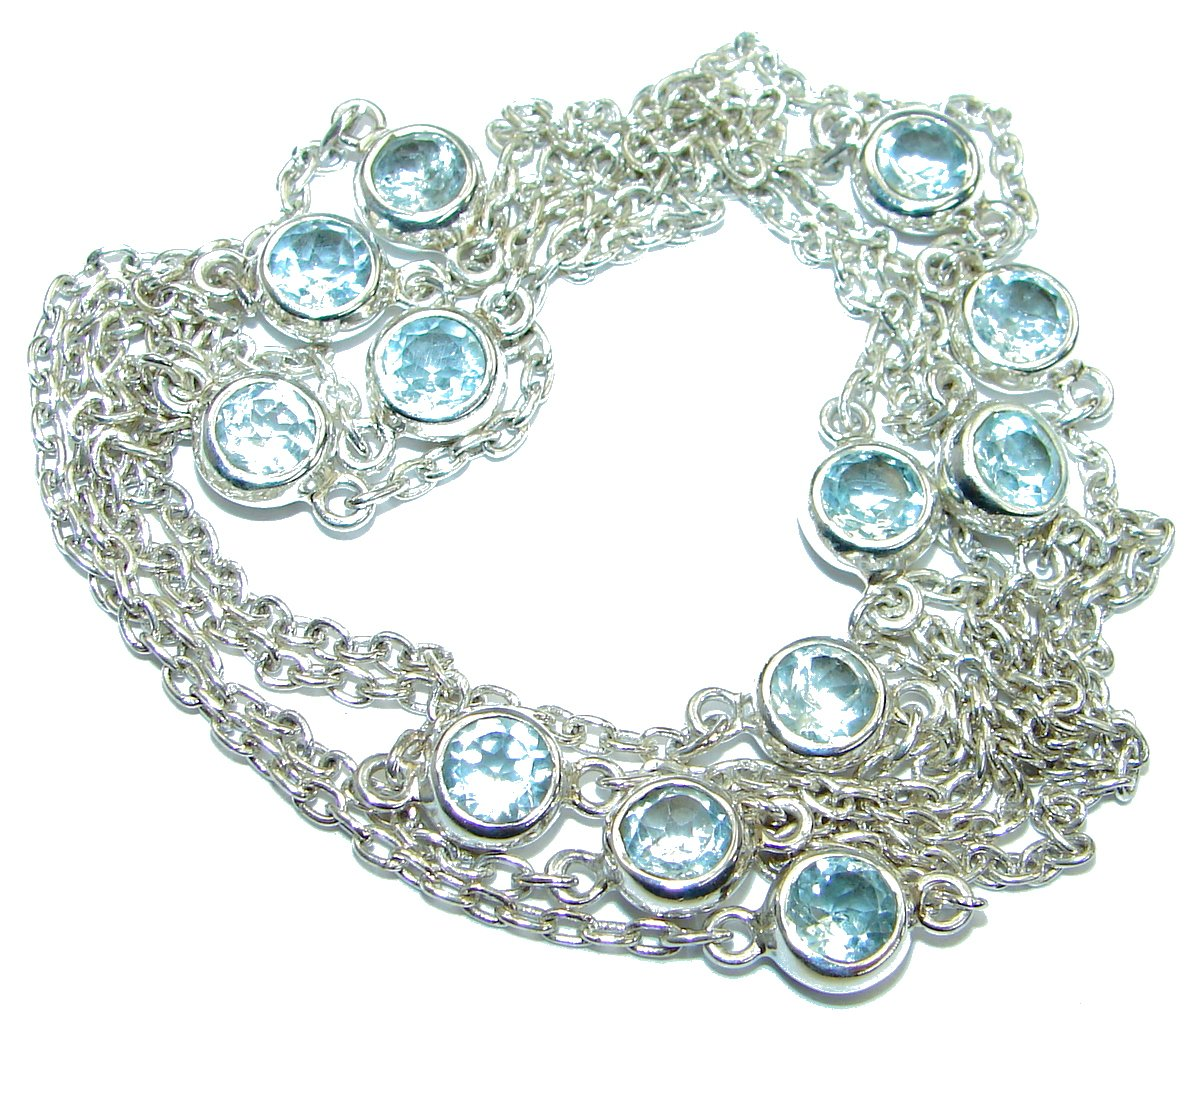 SilverRush Style Swiss Blue Topaz Women 925 Sterling Silver Necklace - FREE GIFT BOX